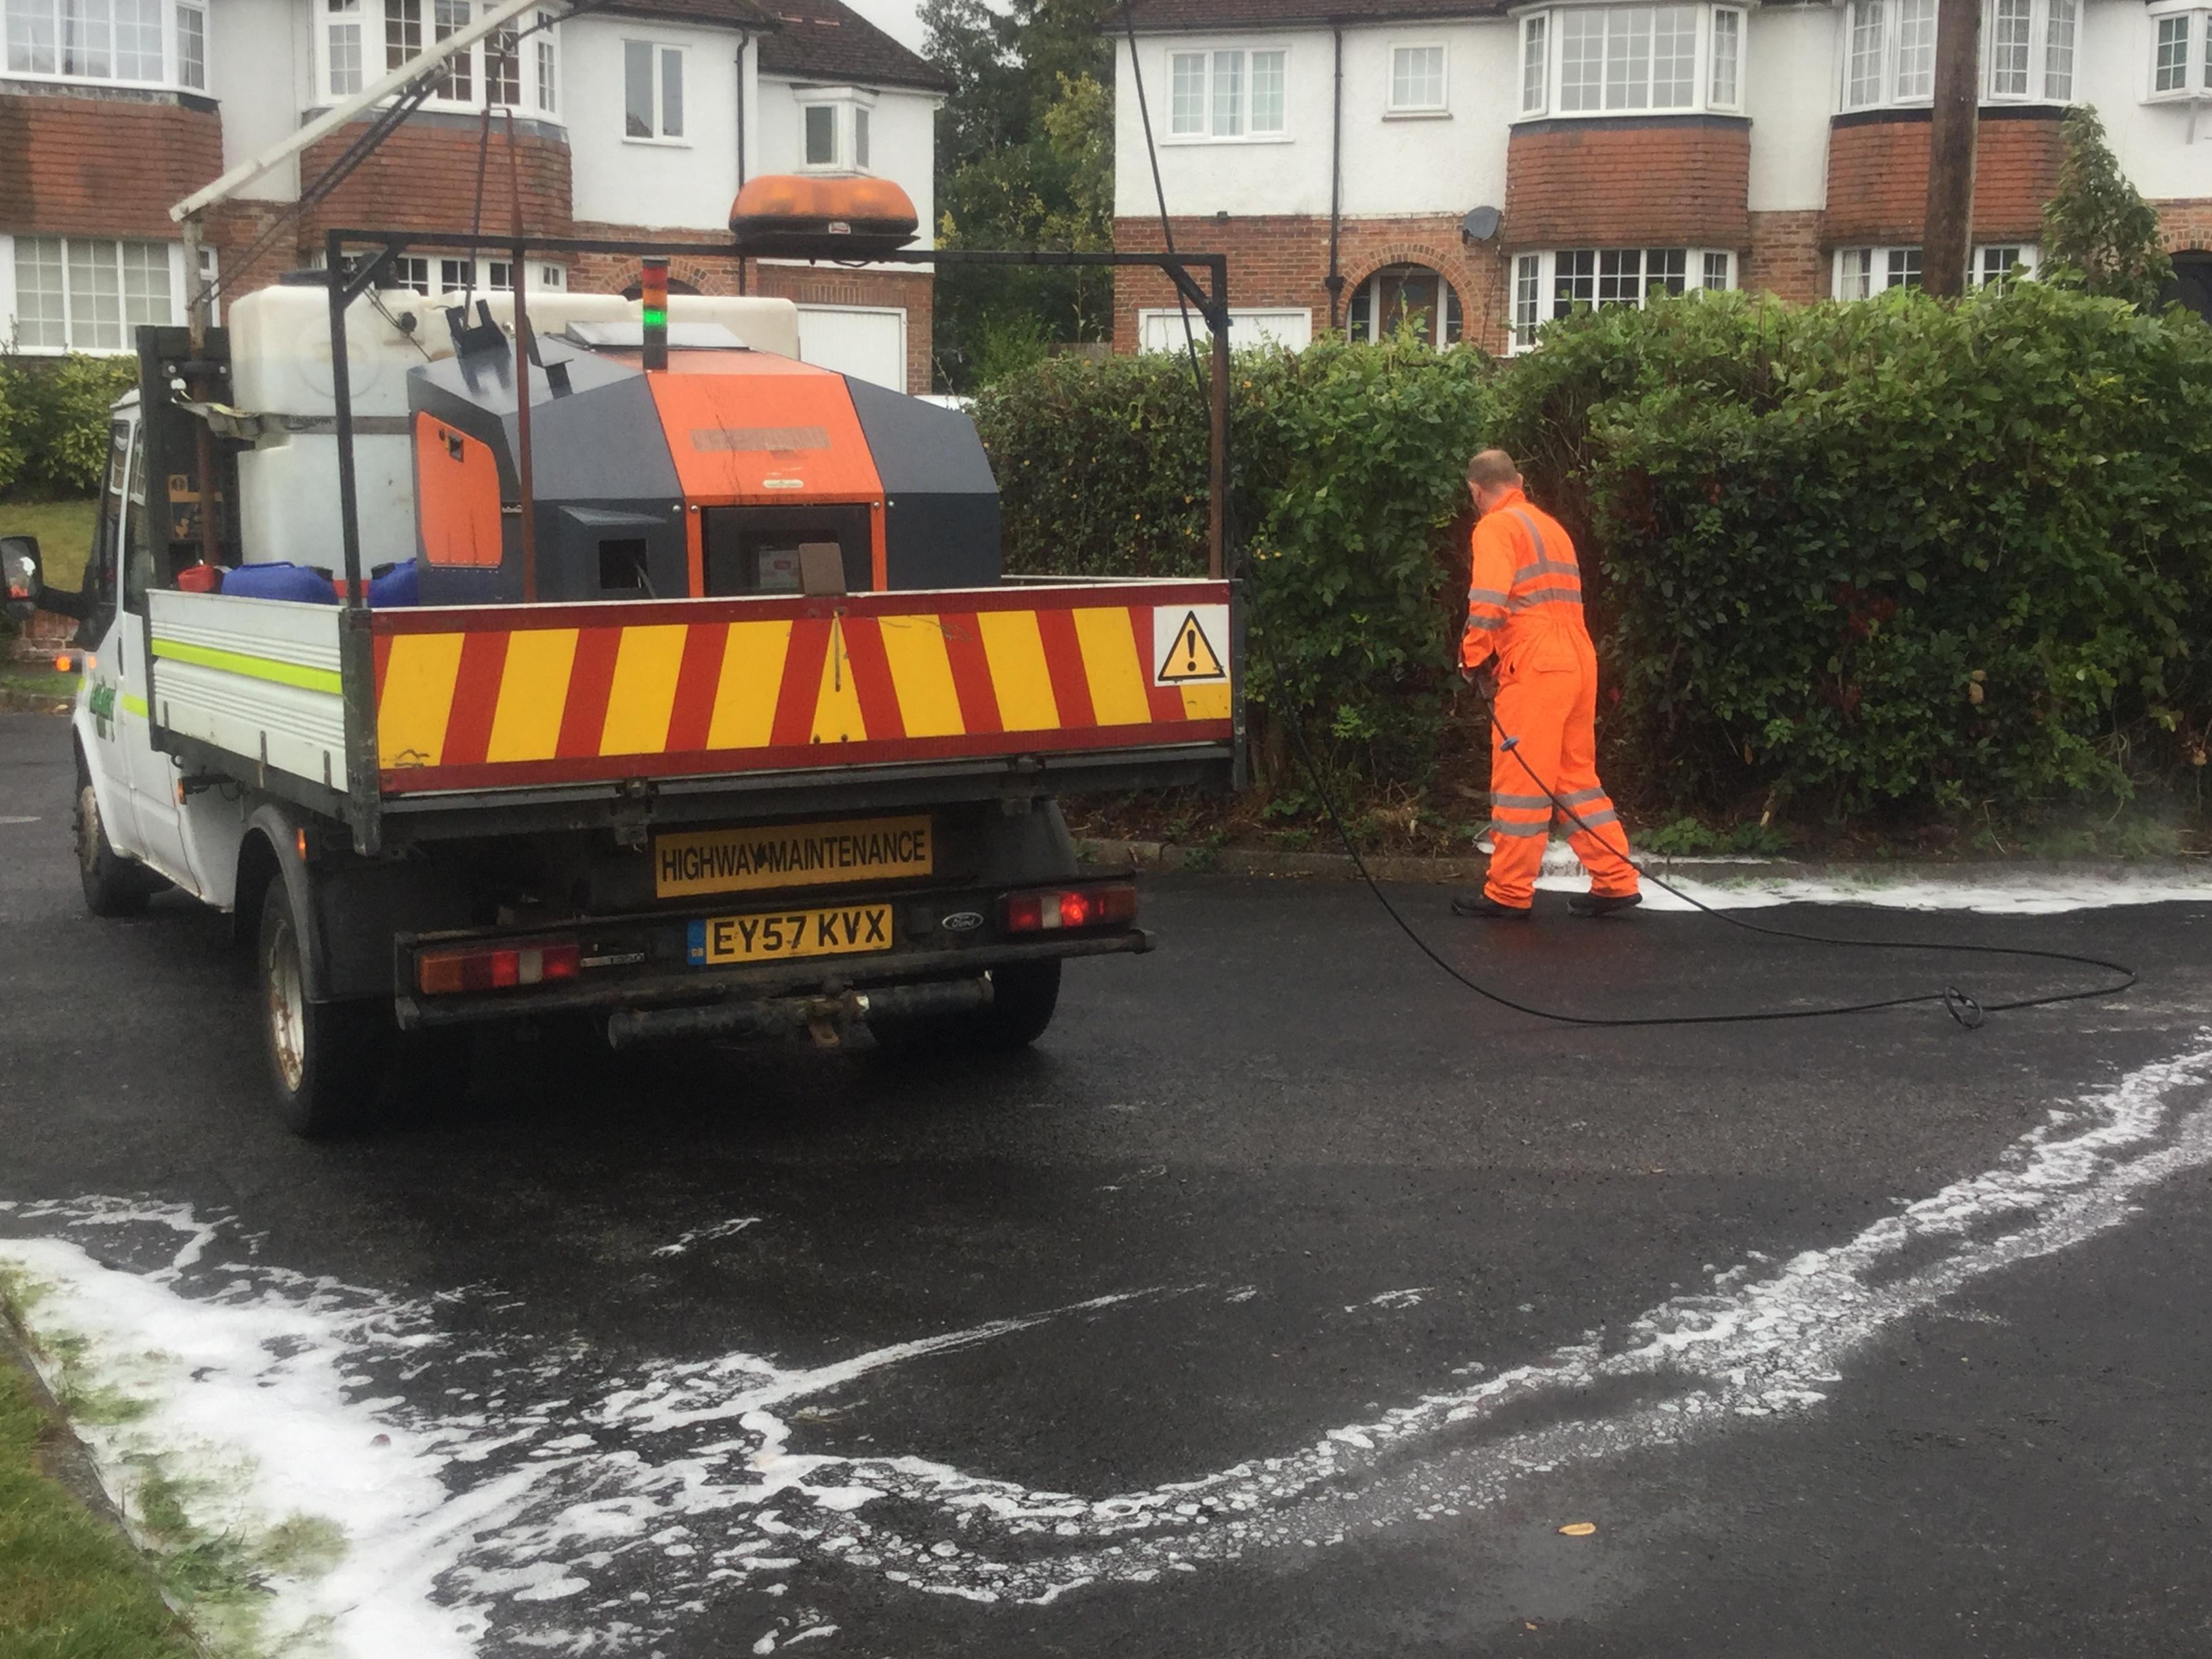 'Hot foam' trial on highways weed control